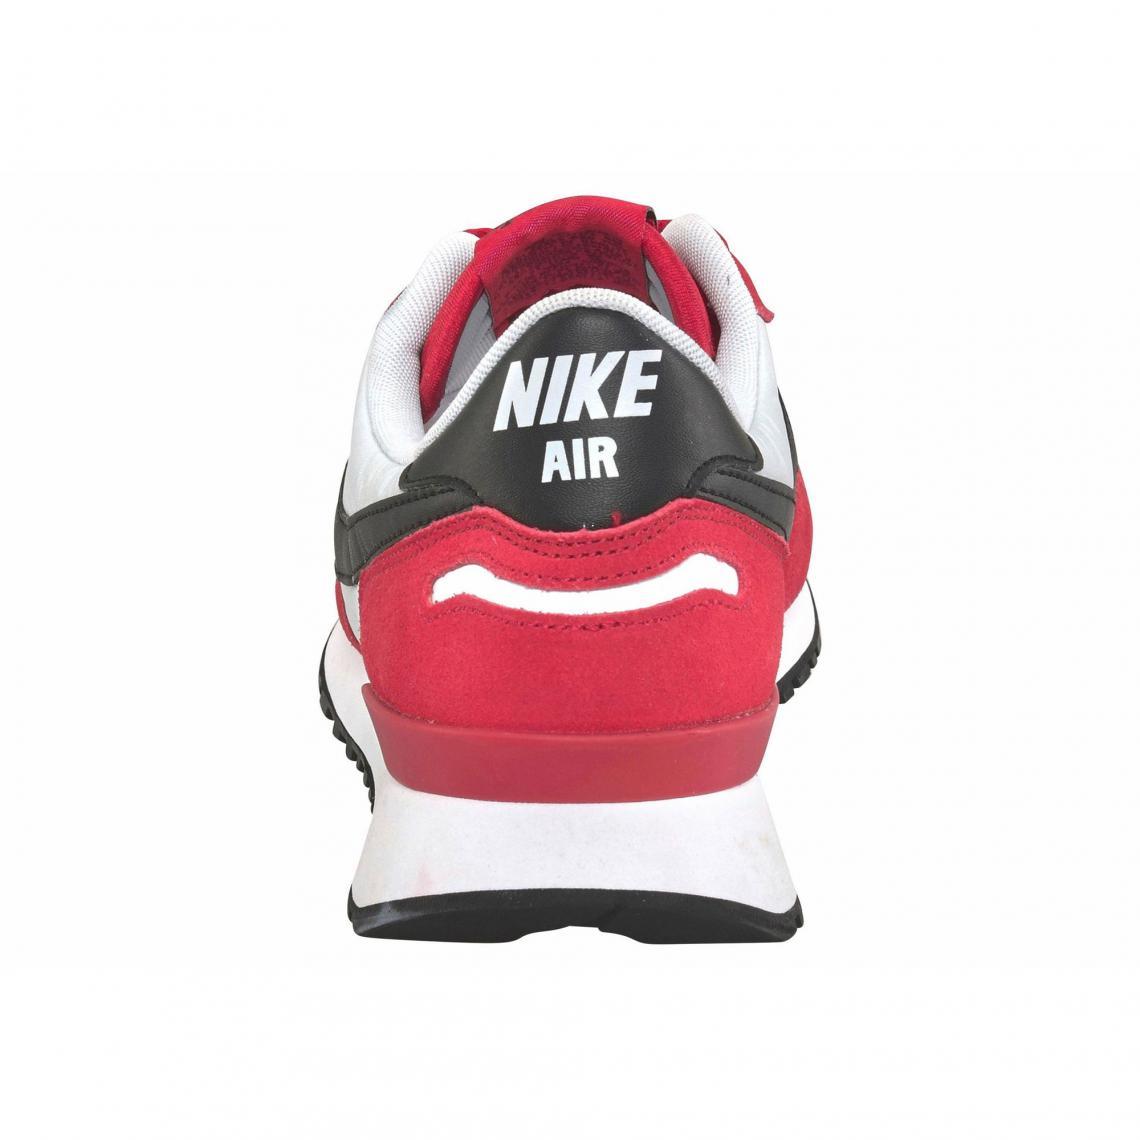 los angeles 77067 aa5dd Nike Air Vortex chaussures de running homme - Rouge - Noir Nike